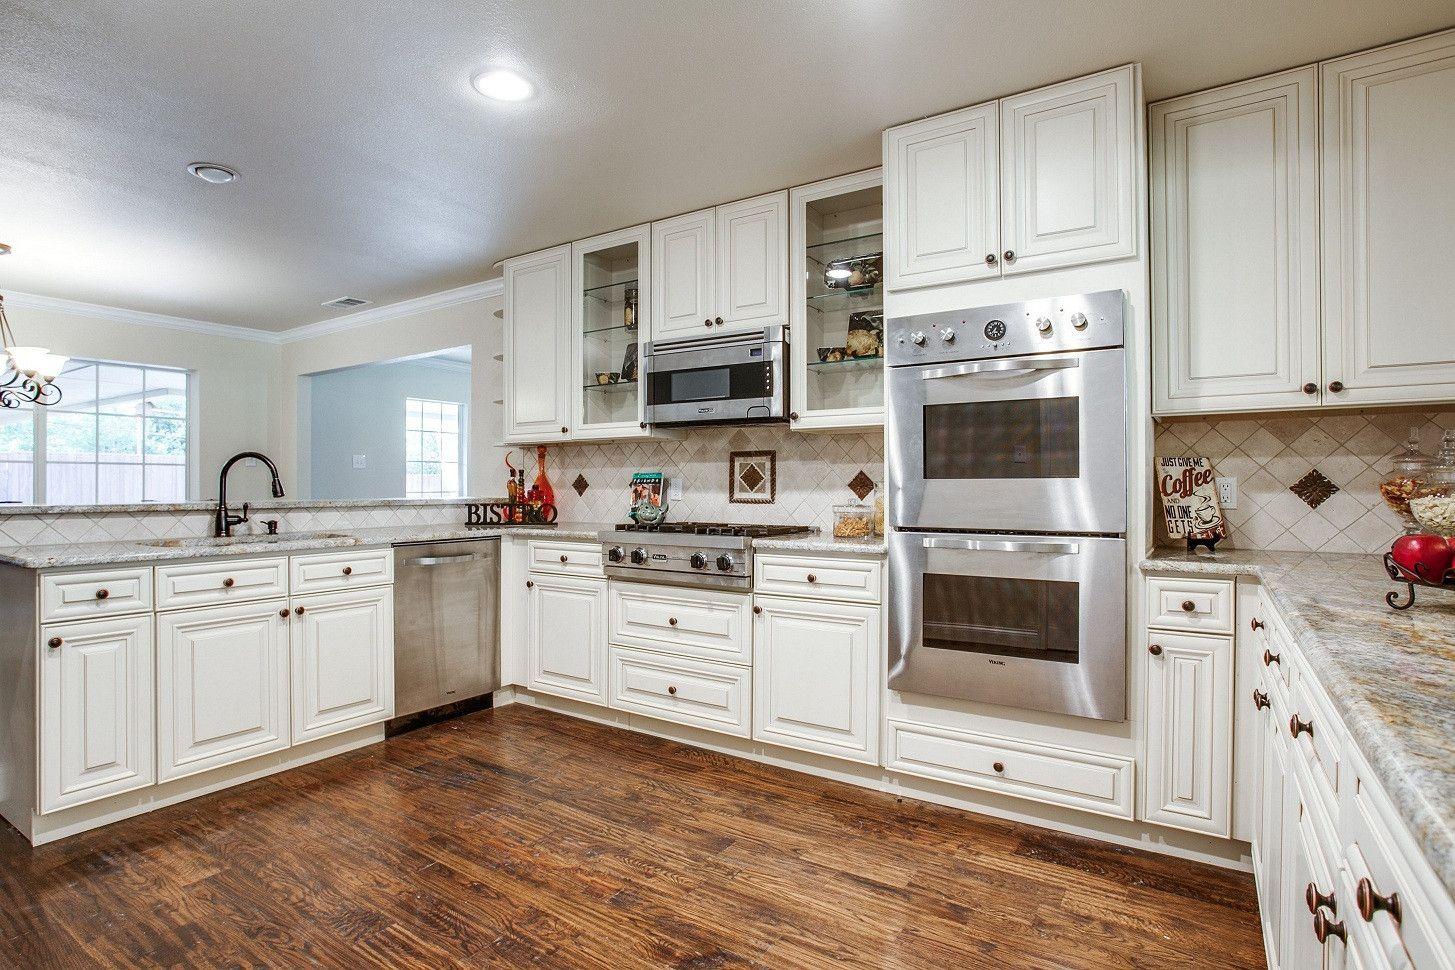 99+ Kitchen Cabinet Color Ideas with White Appliances ...